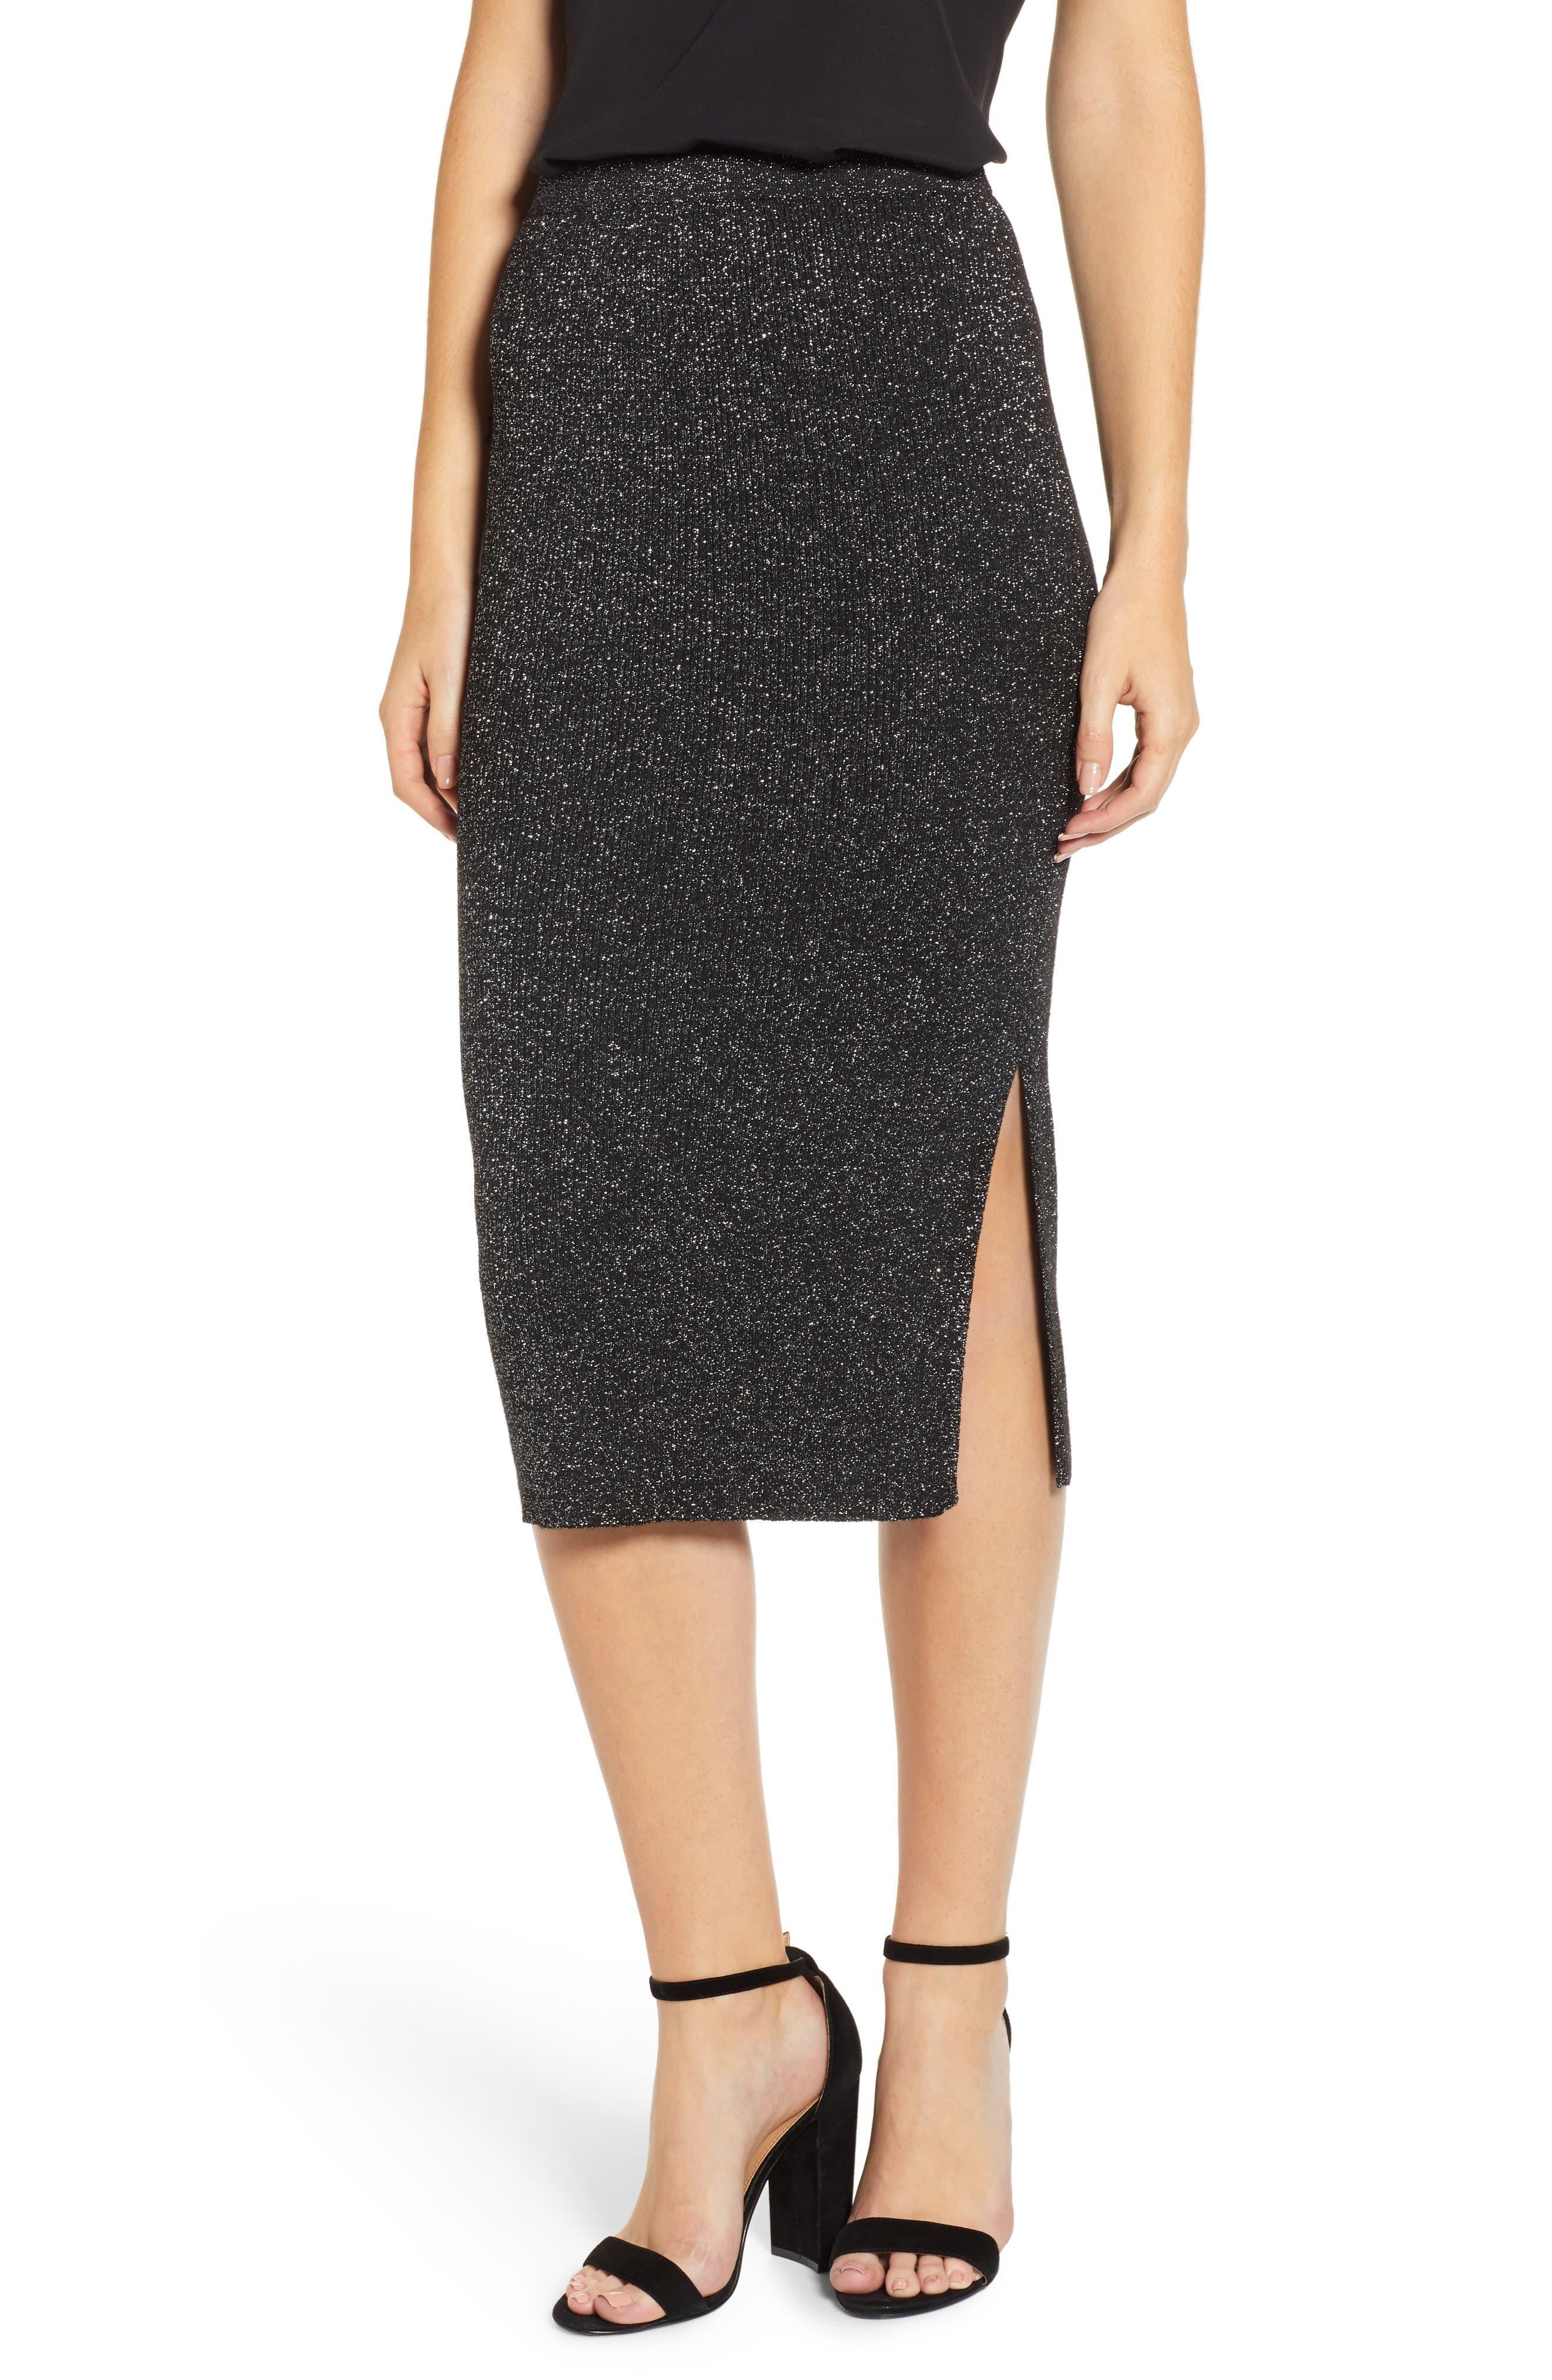 Metallic Pencil Skirt,                             Main thumbnail 1, color,                             BLACK- SILVER SPANGLE METALLIC